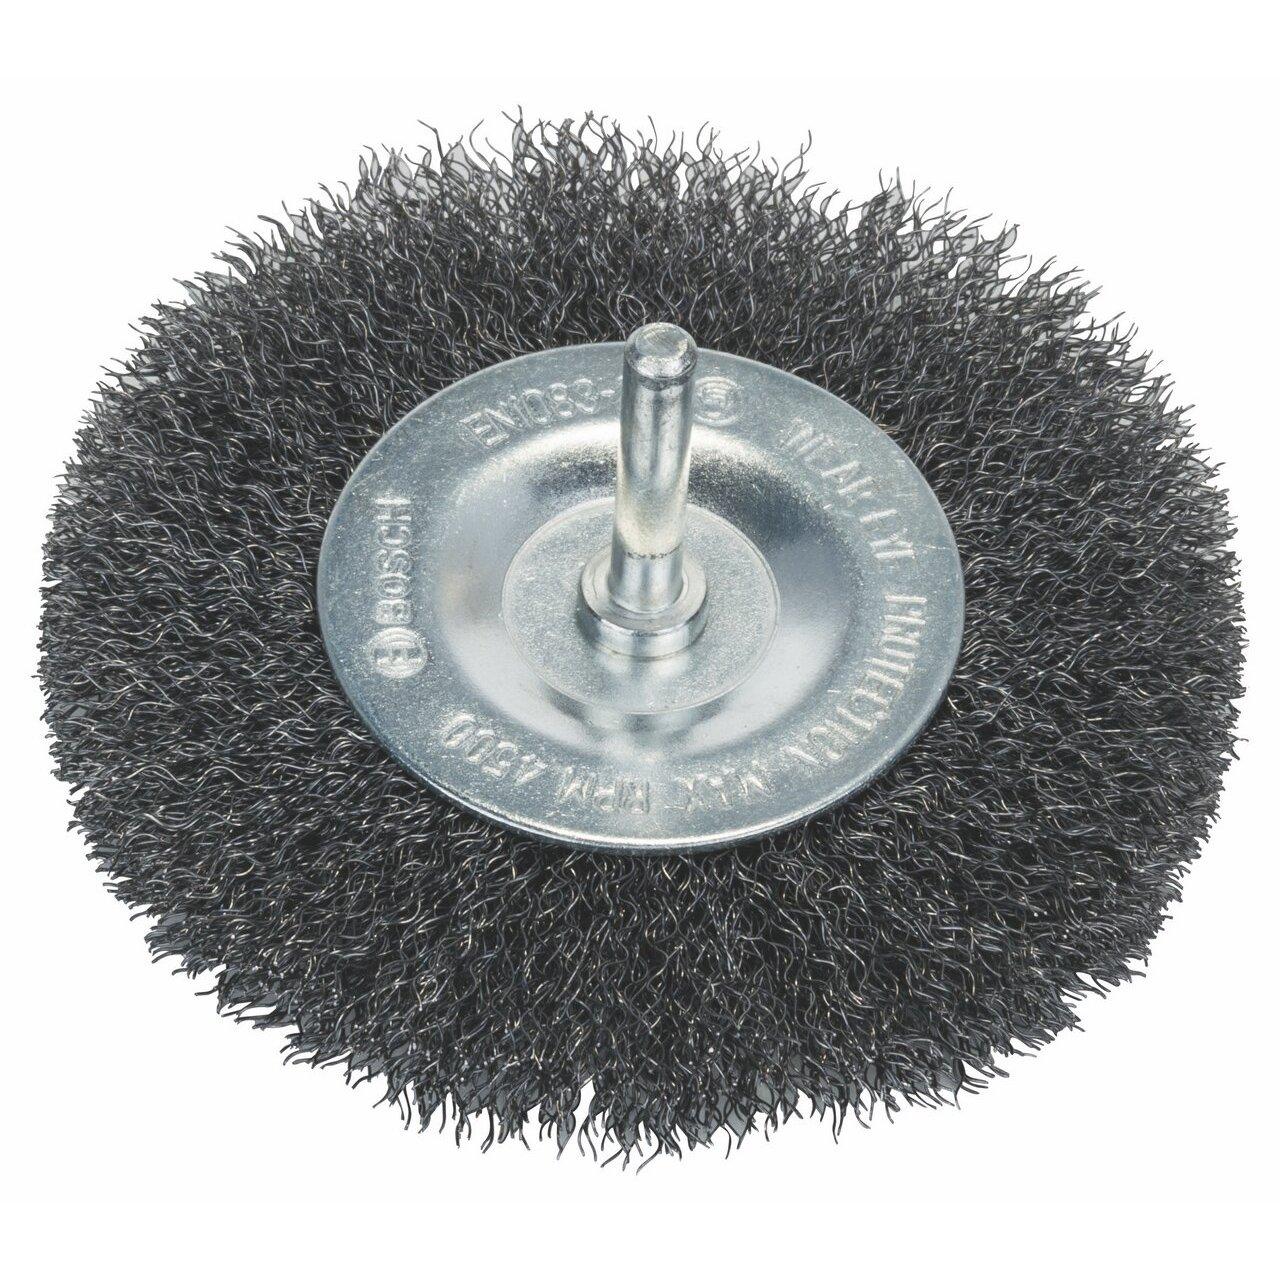 Bosch 1609200273 Brosse circulaire 100 mm 0, 3 mm 10 mm à fils ondulés 3 mm 10 mm à fils ondulés Bosch Professional